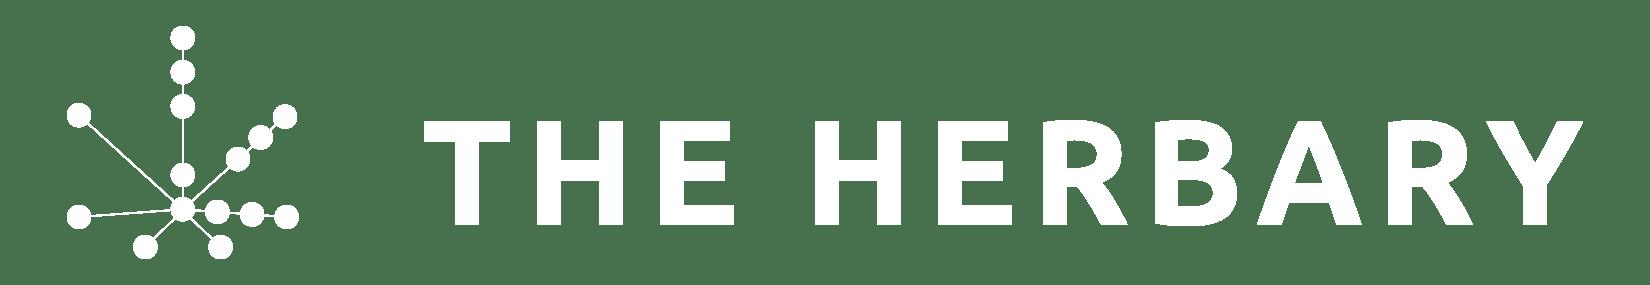 The-Herbary